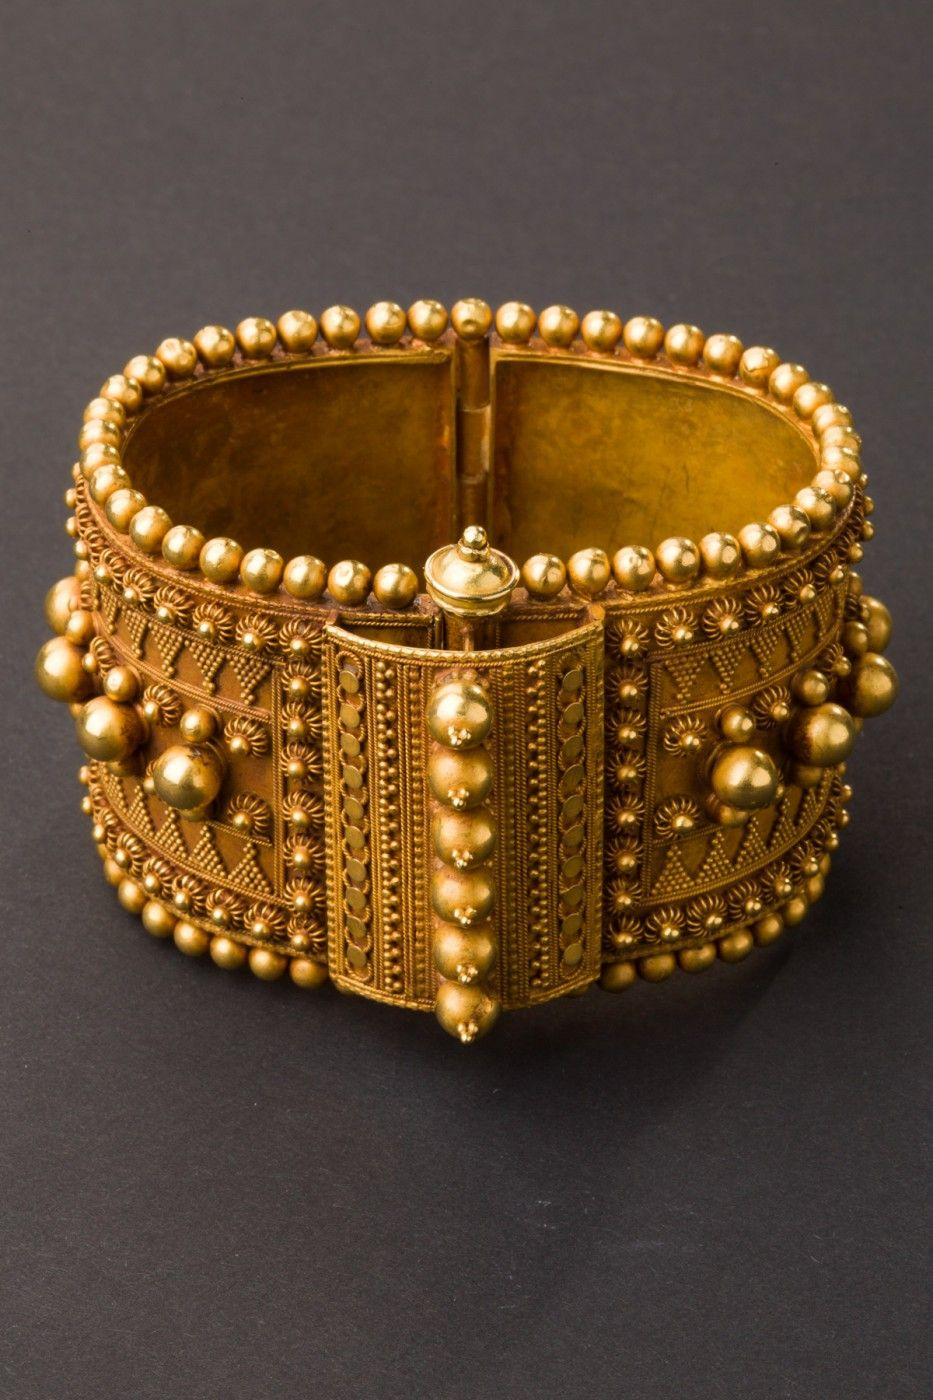 Tamil Nadu South India 22kt Gold bracelet ca Beginning of the